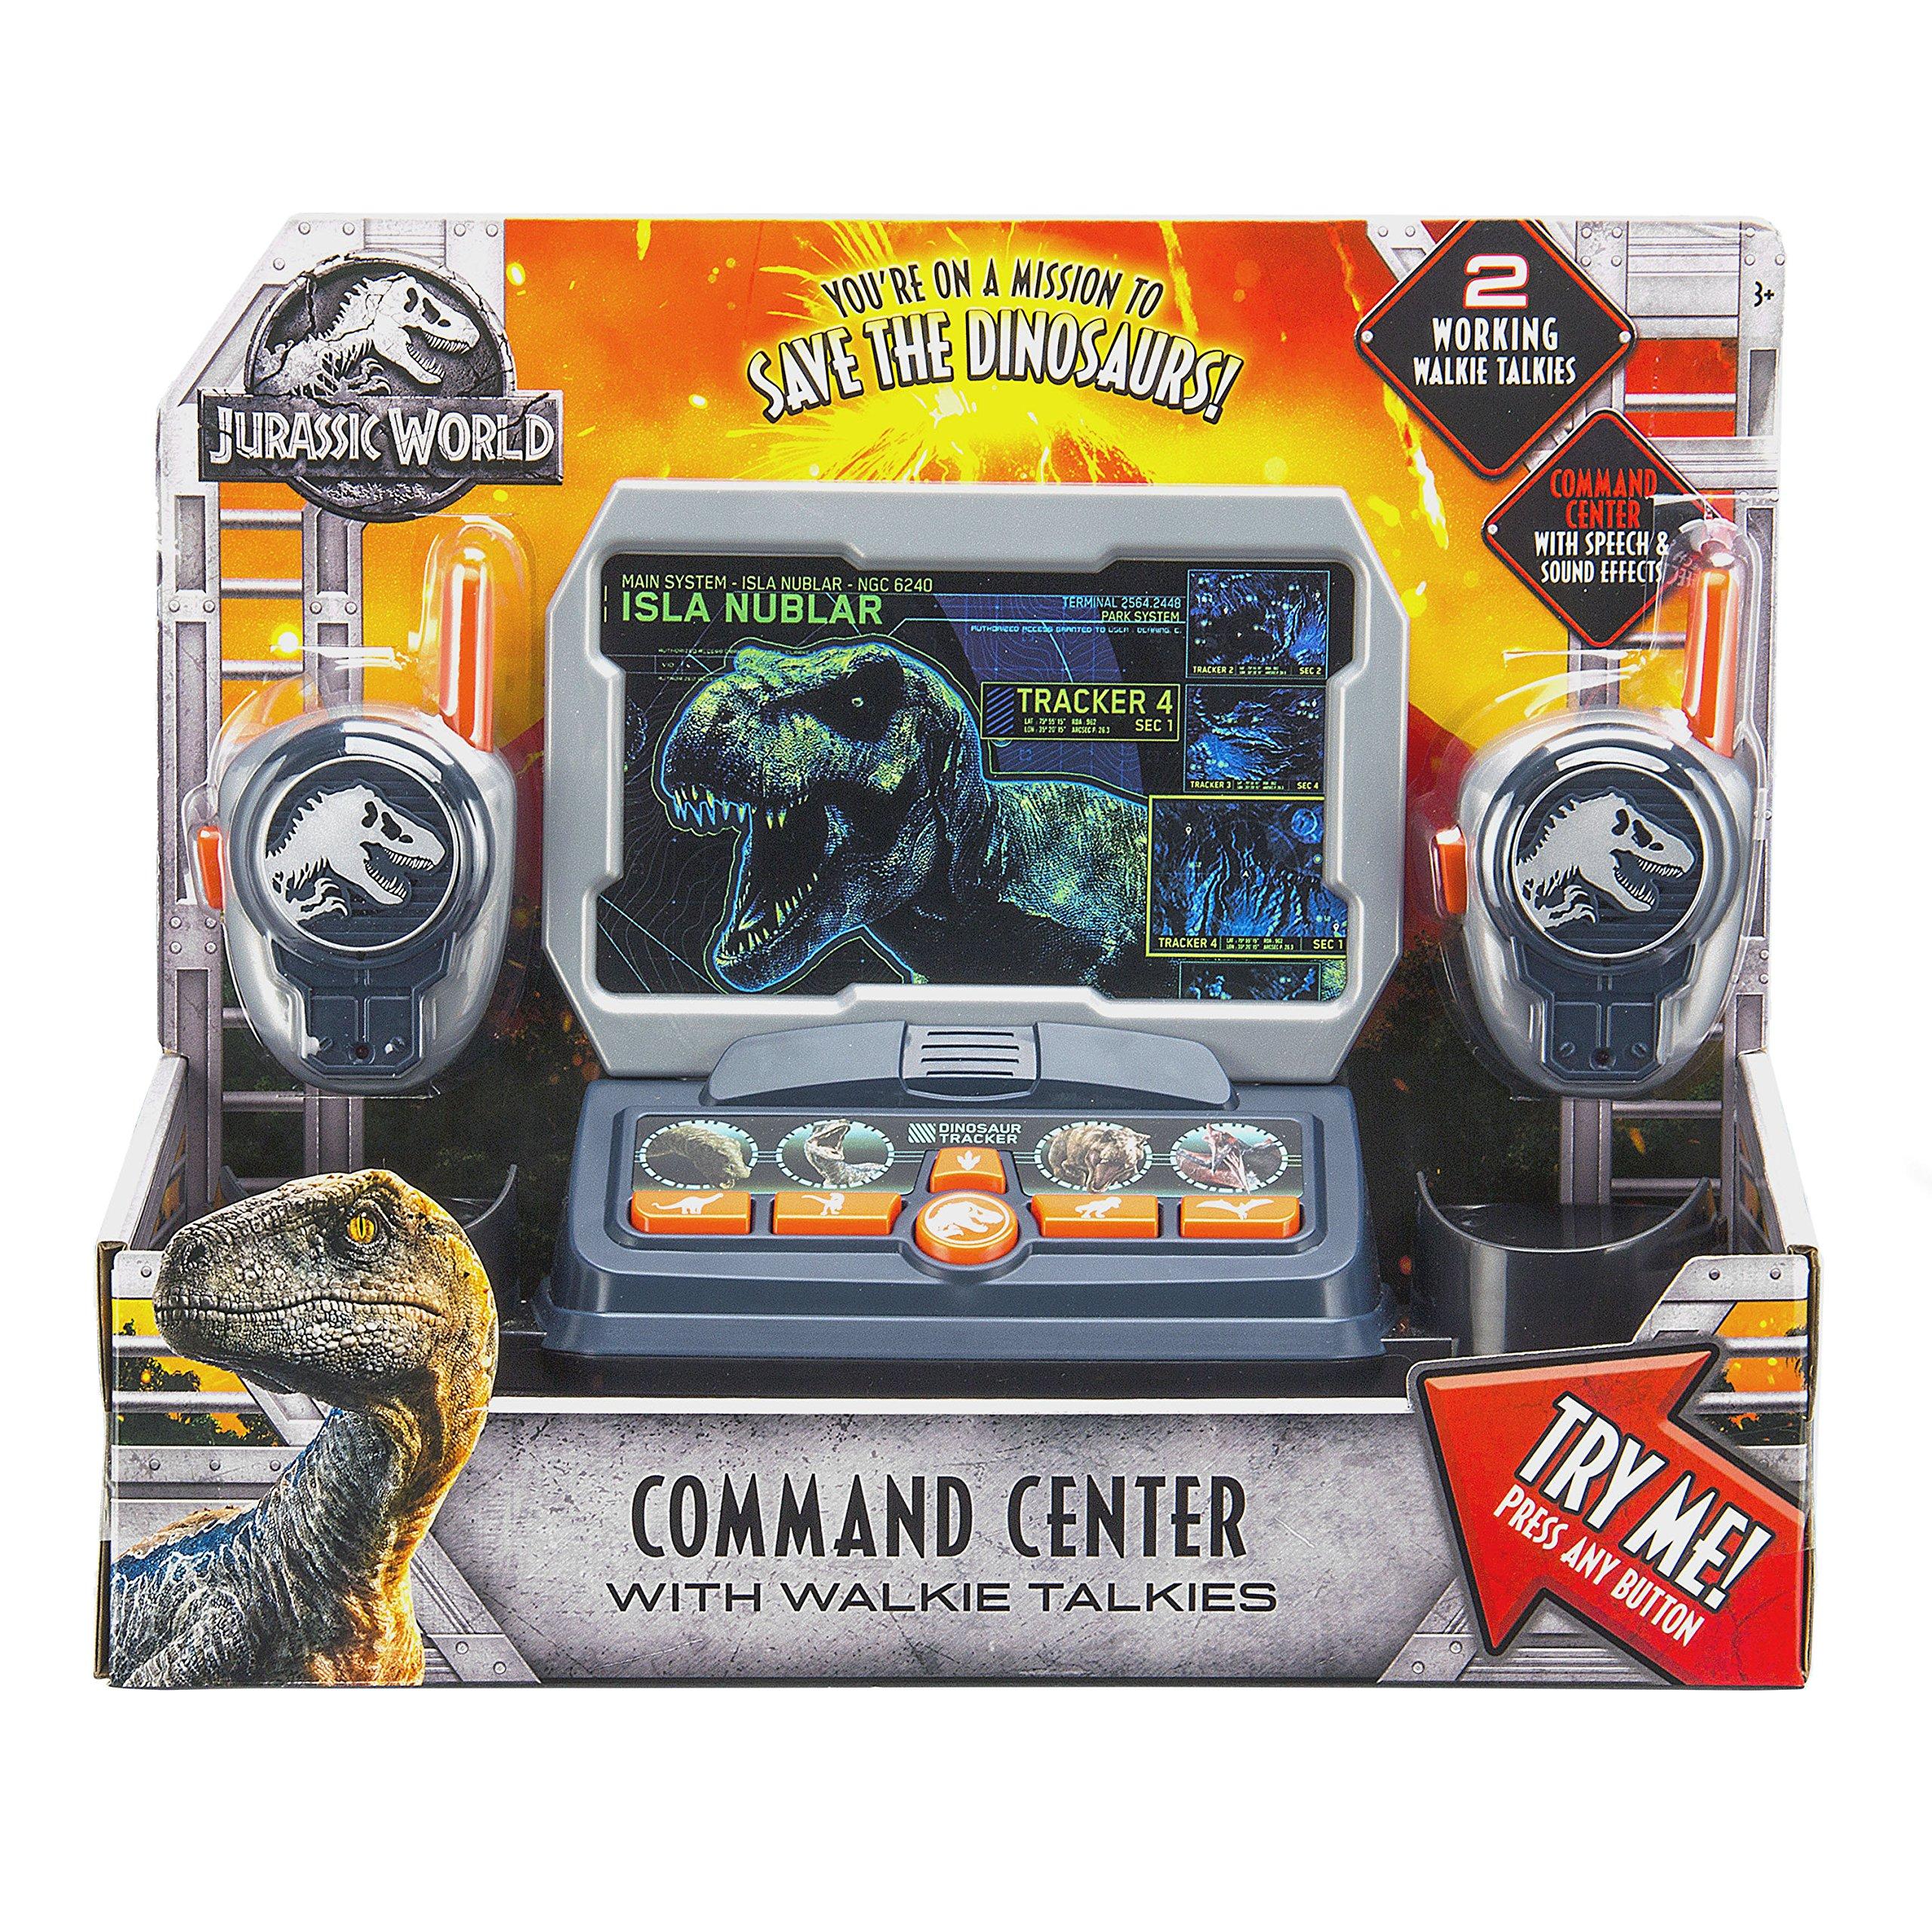 eKids Jurassic World 2 Command Center with Kid Friendly Walkie Talkies and Speech & Sound Effects by eKids (Image #5)